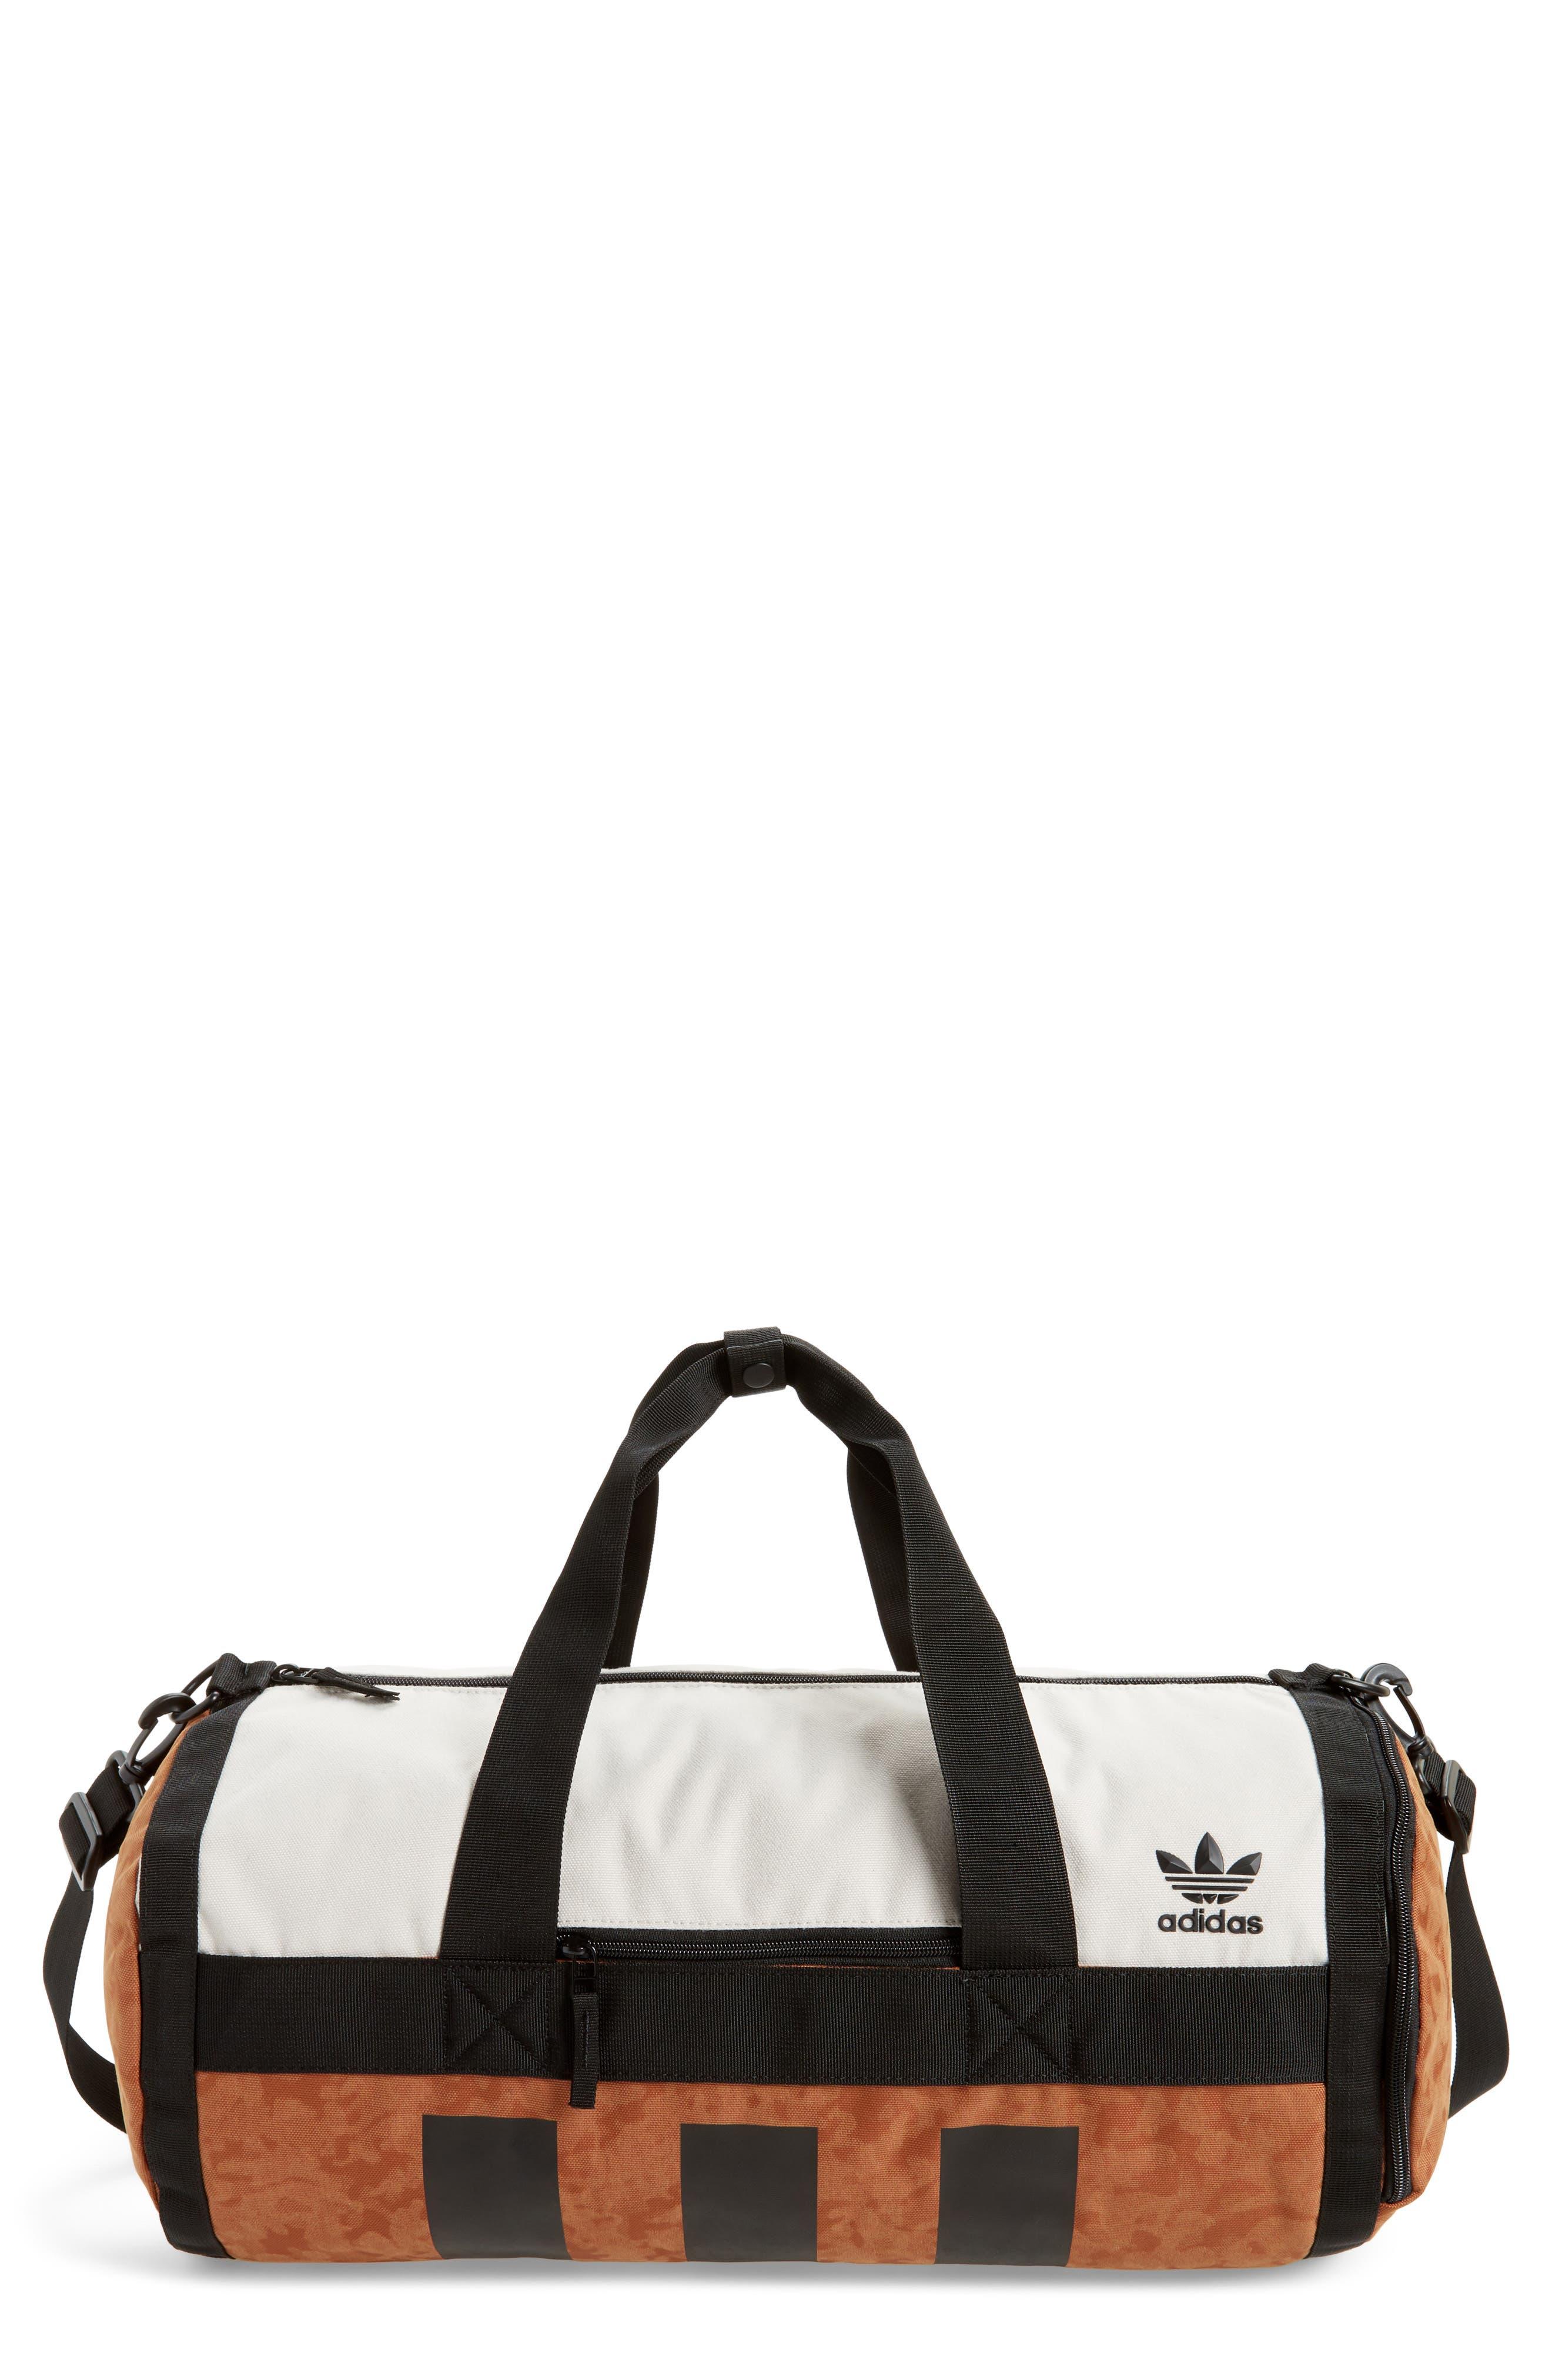 adidas Originals Court Duffel Bag